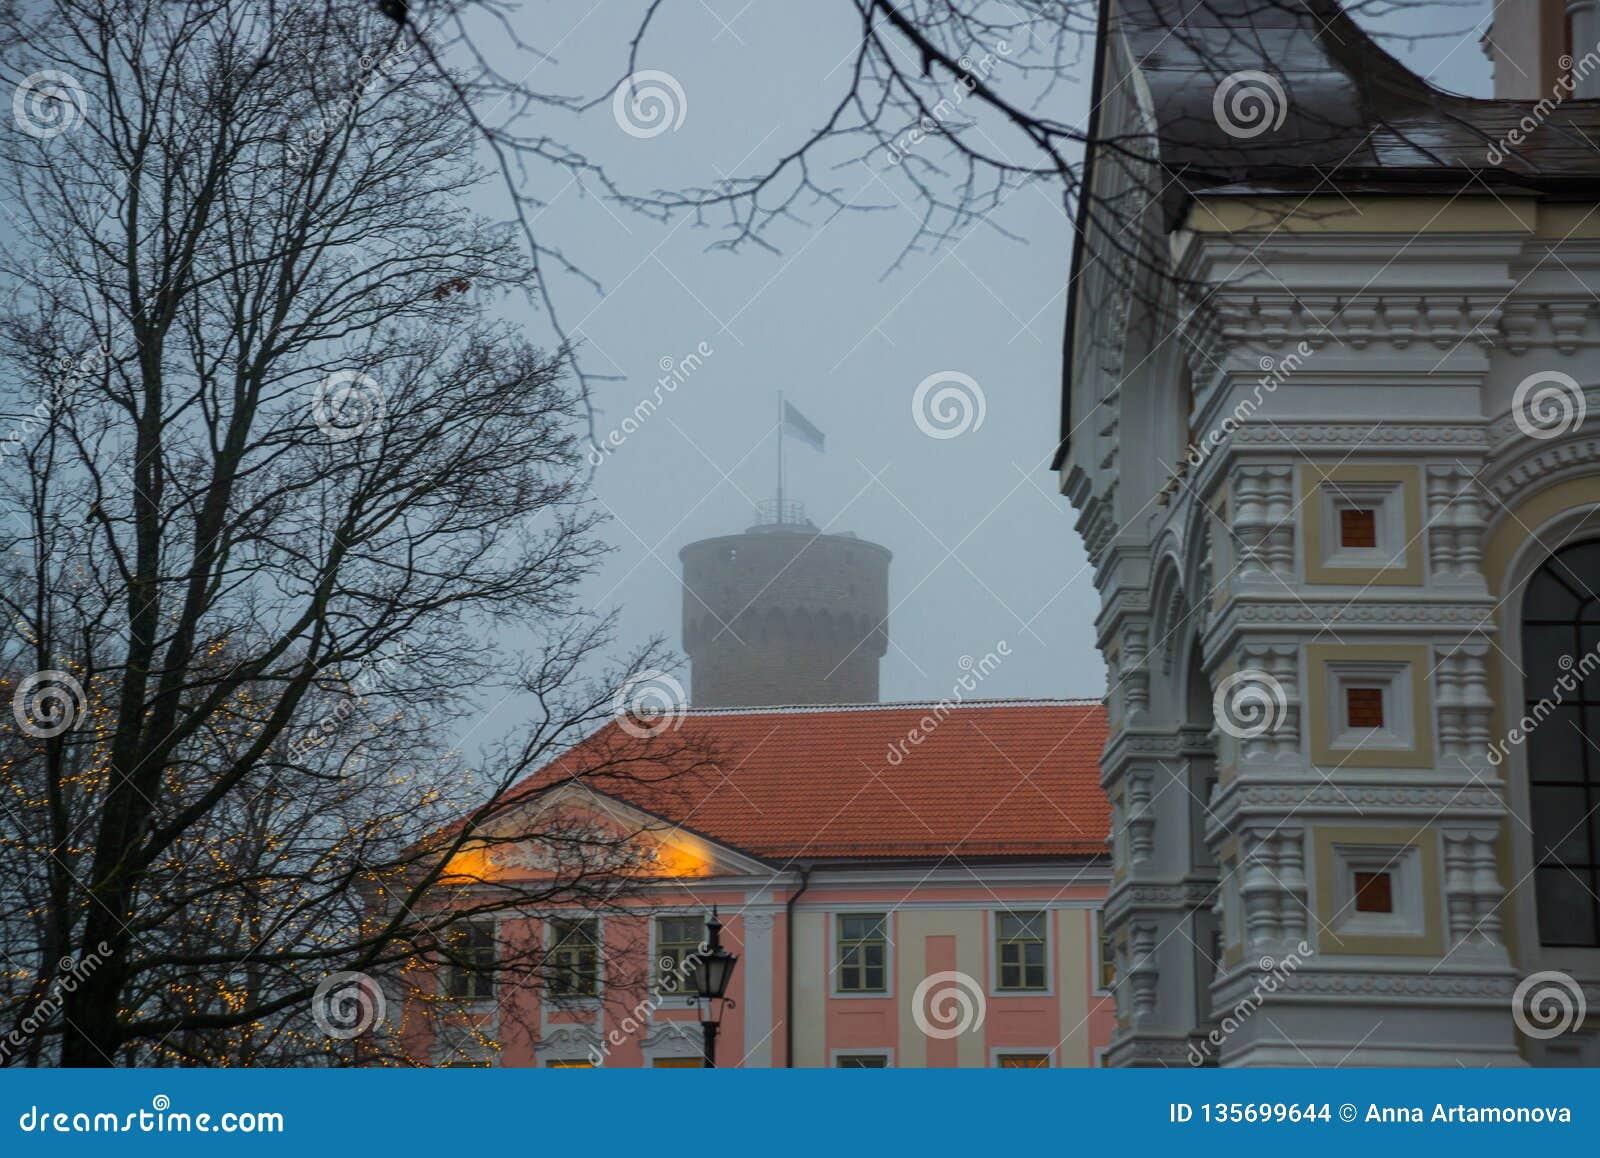 Tall Hermann tower and Parliament building. Toompea, Governors garden, Tallinn, Estonia